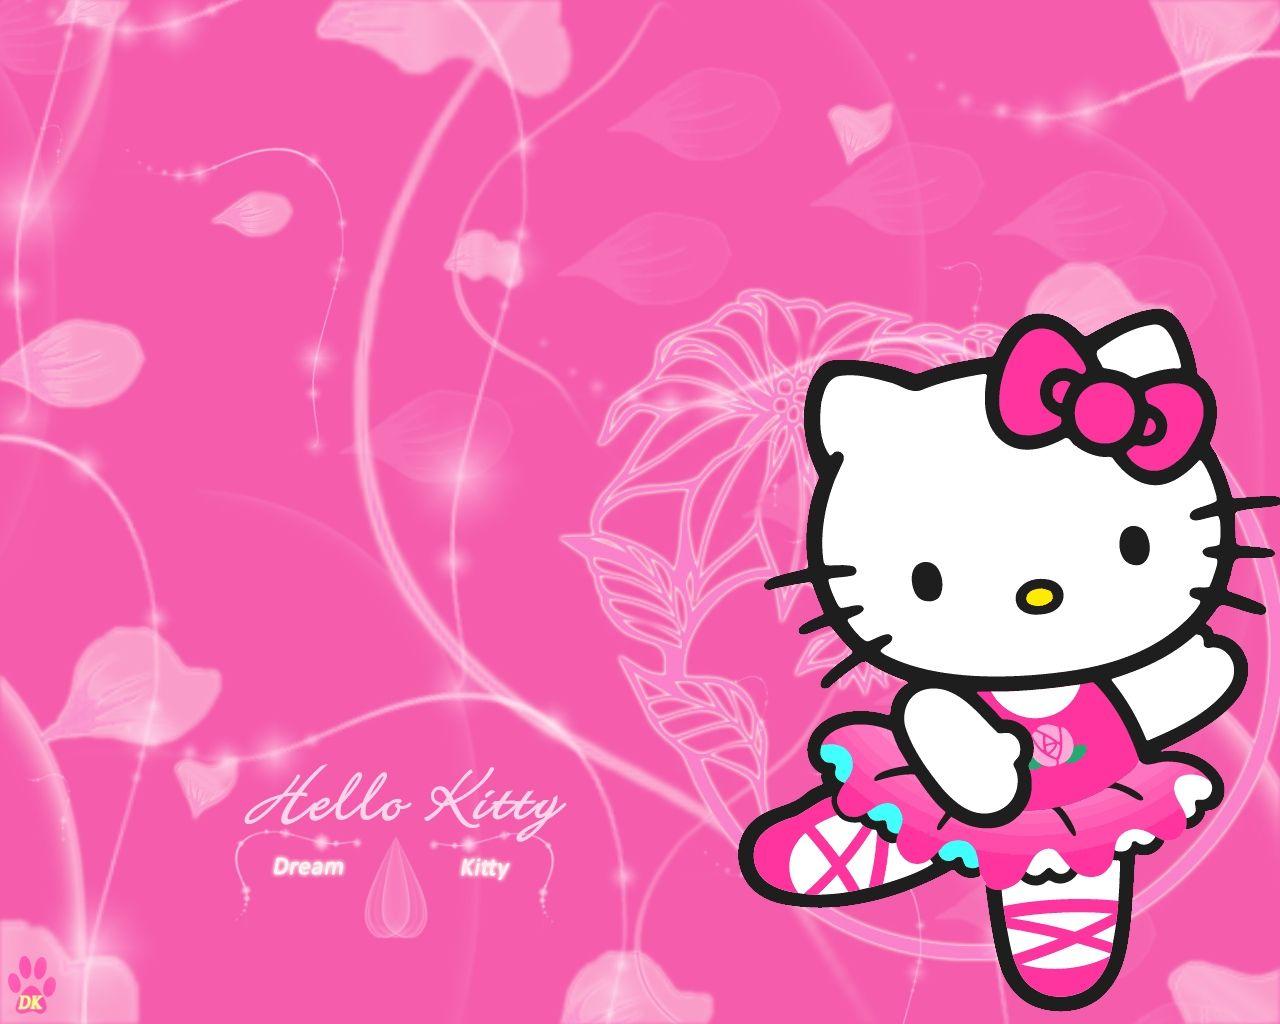 Good Wallpaper Hello Kitty Cute - 75c80f19d7a2de8595834a3eb077a4ac  Trends_659766.jpg